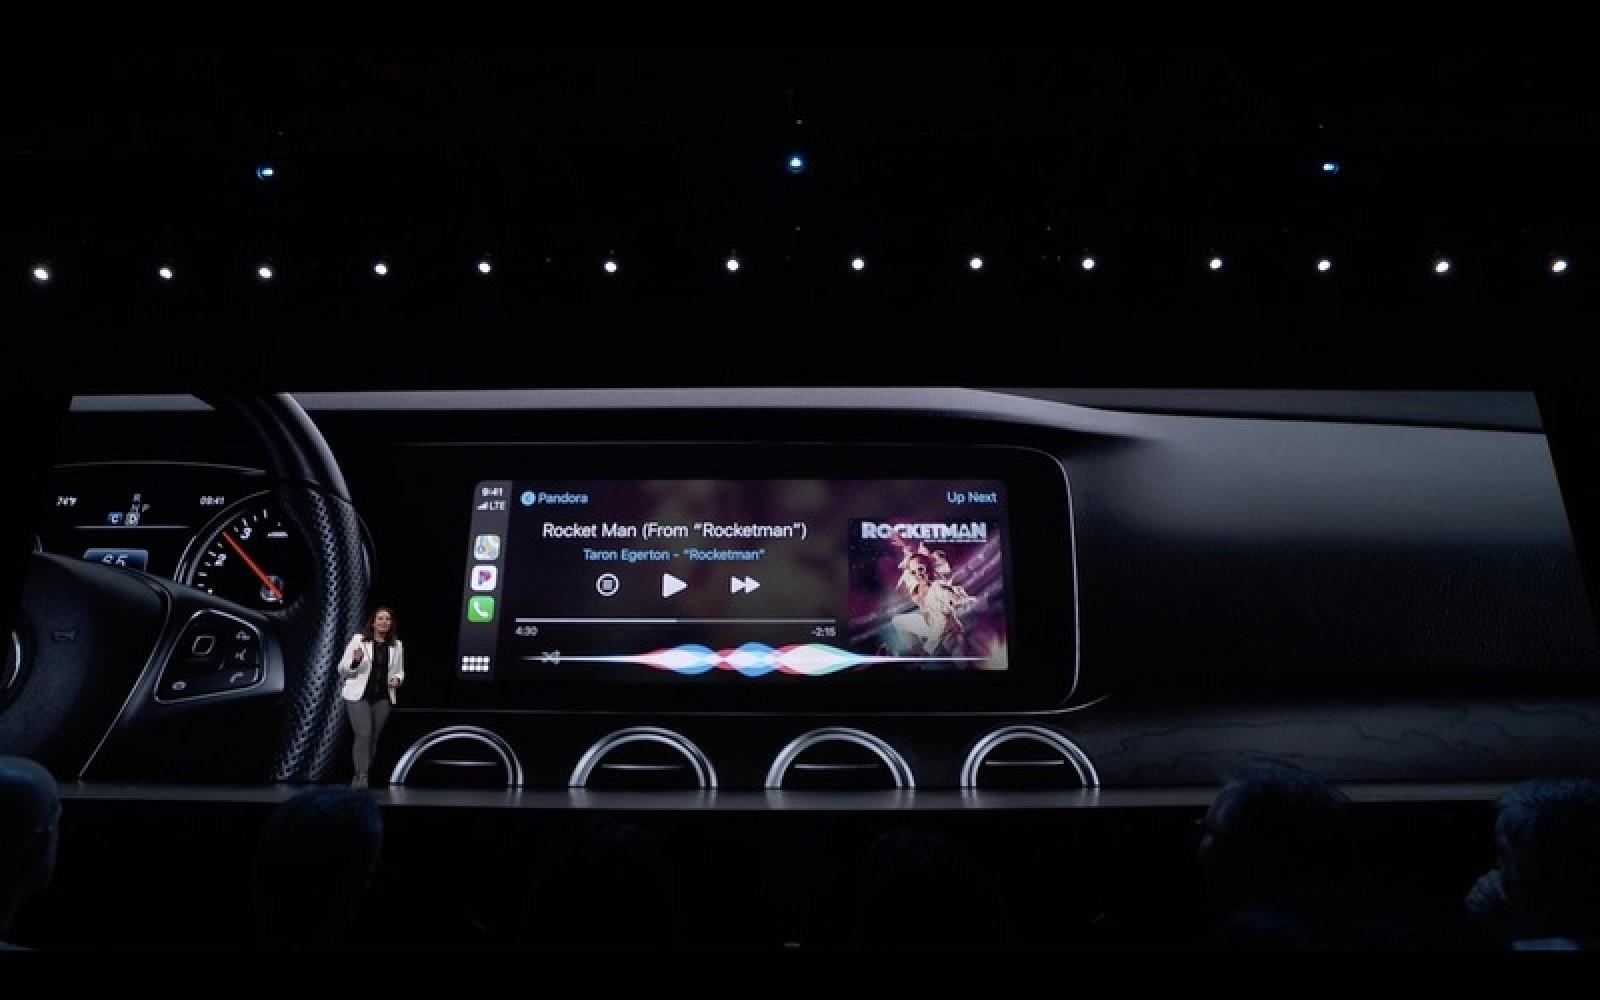 Apple Says iOS 13 to Bring 'Biggest Update to CarPlay Yet